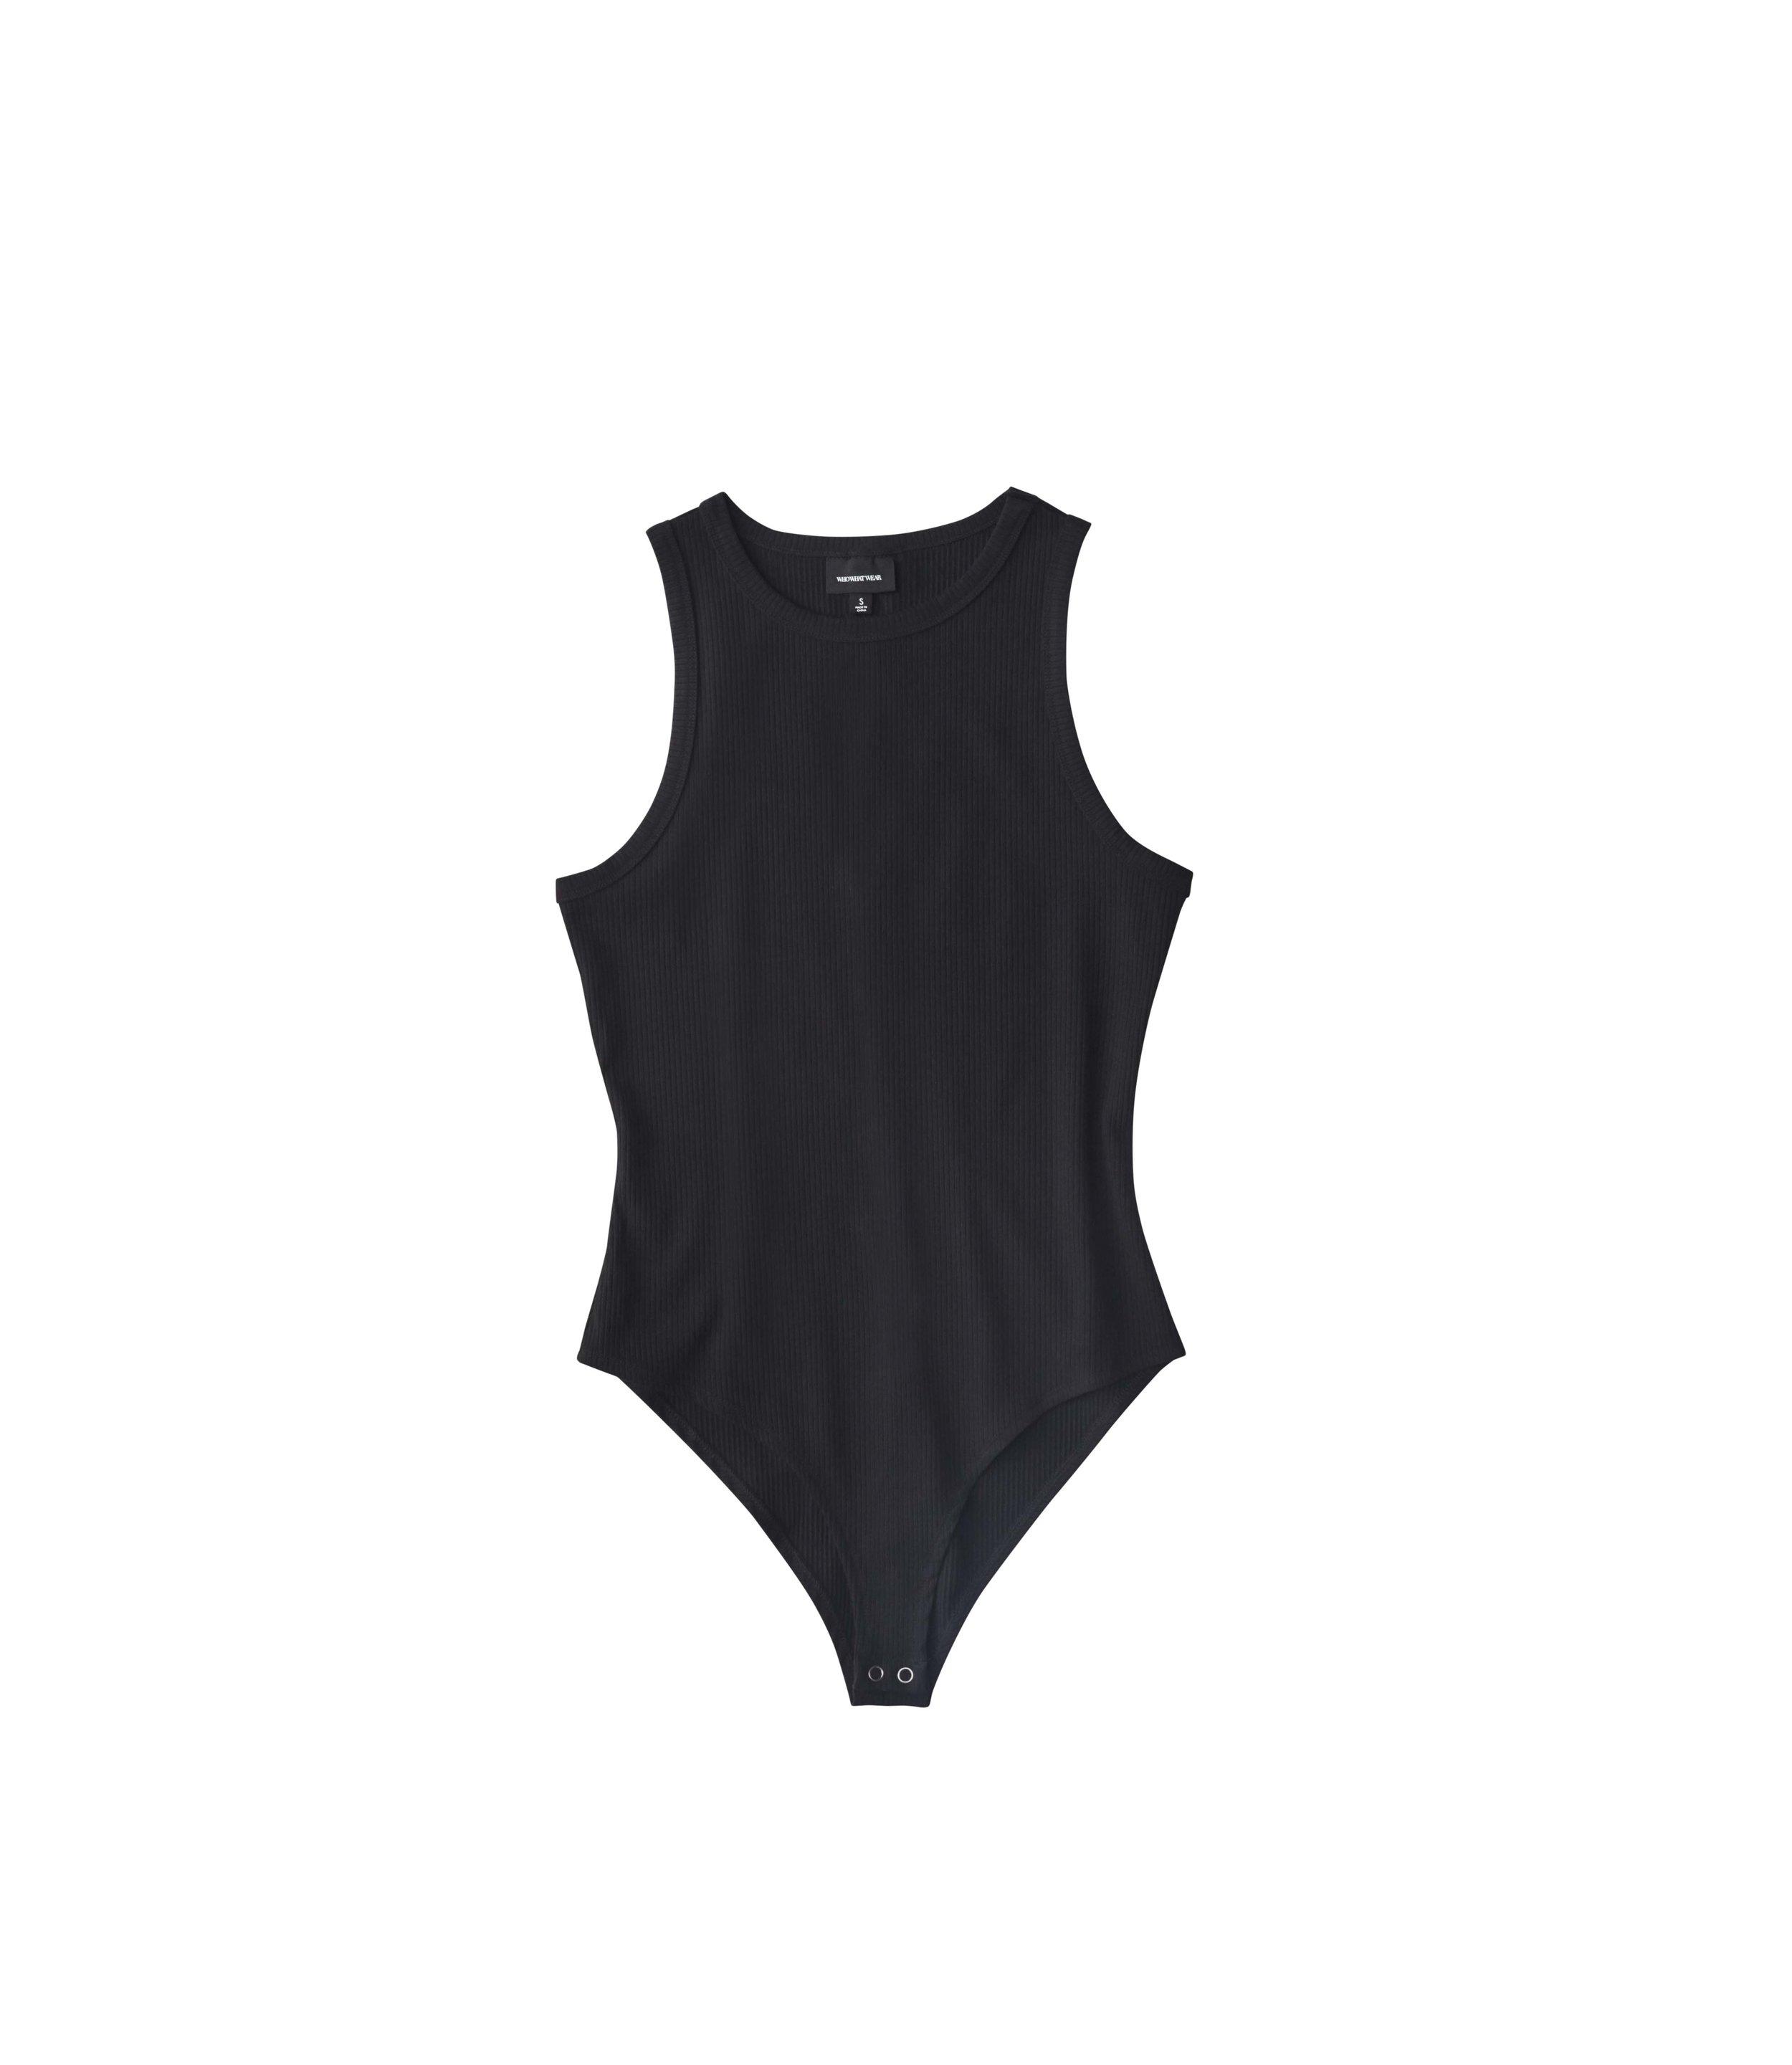 The perfect bodysuit!